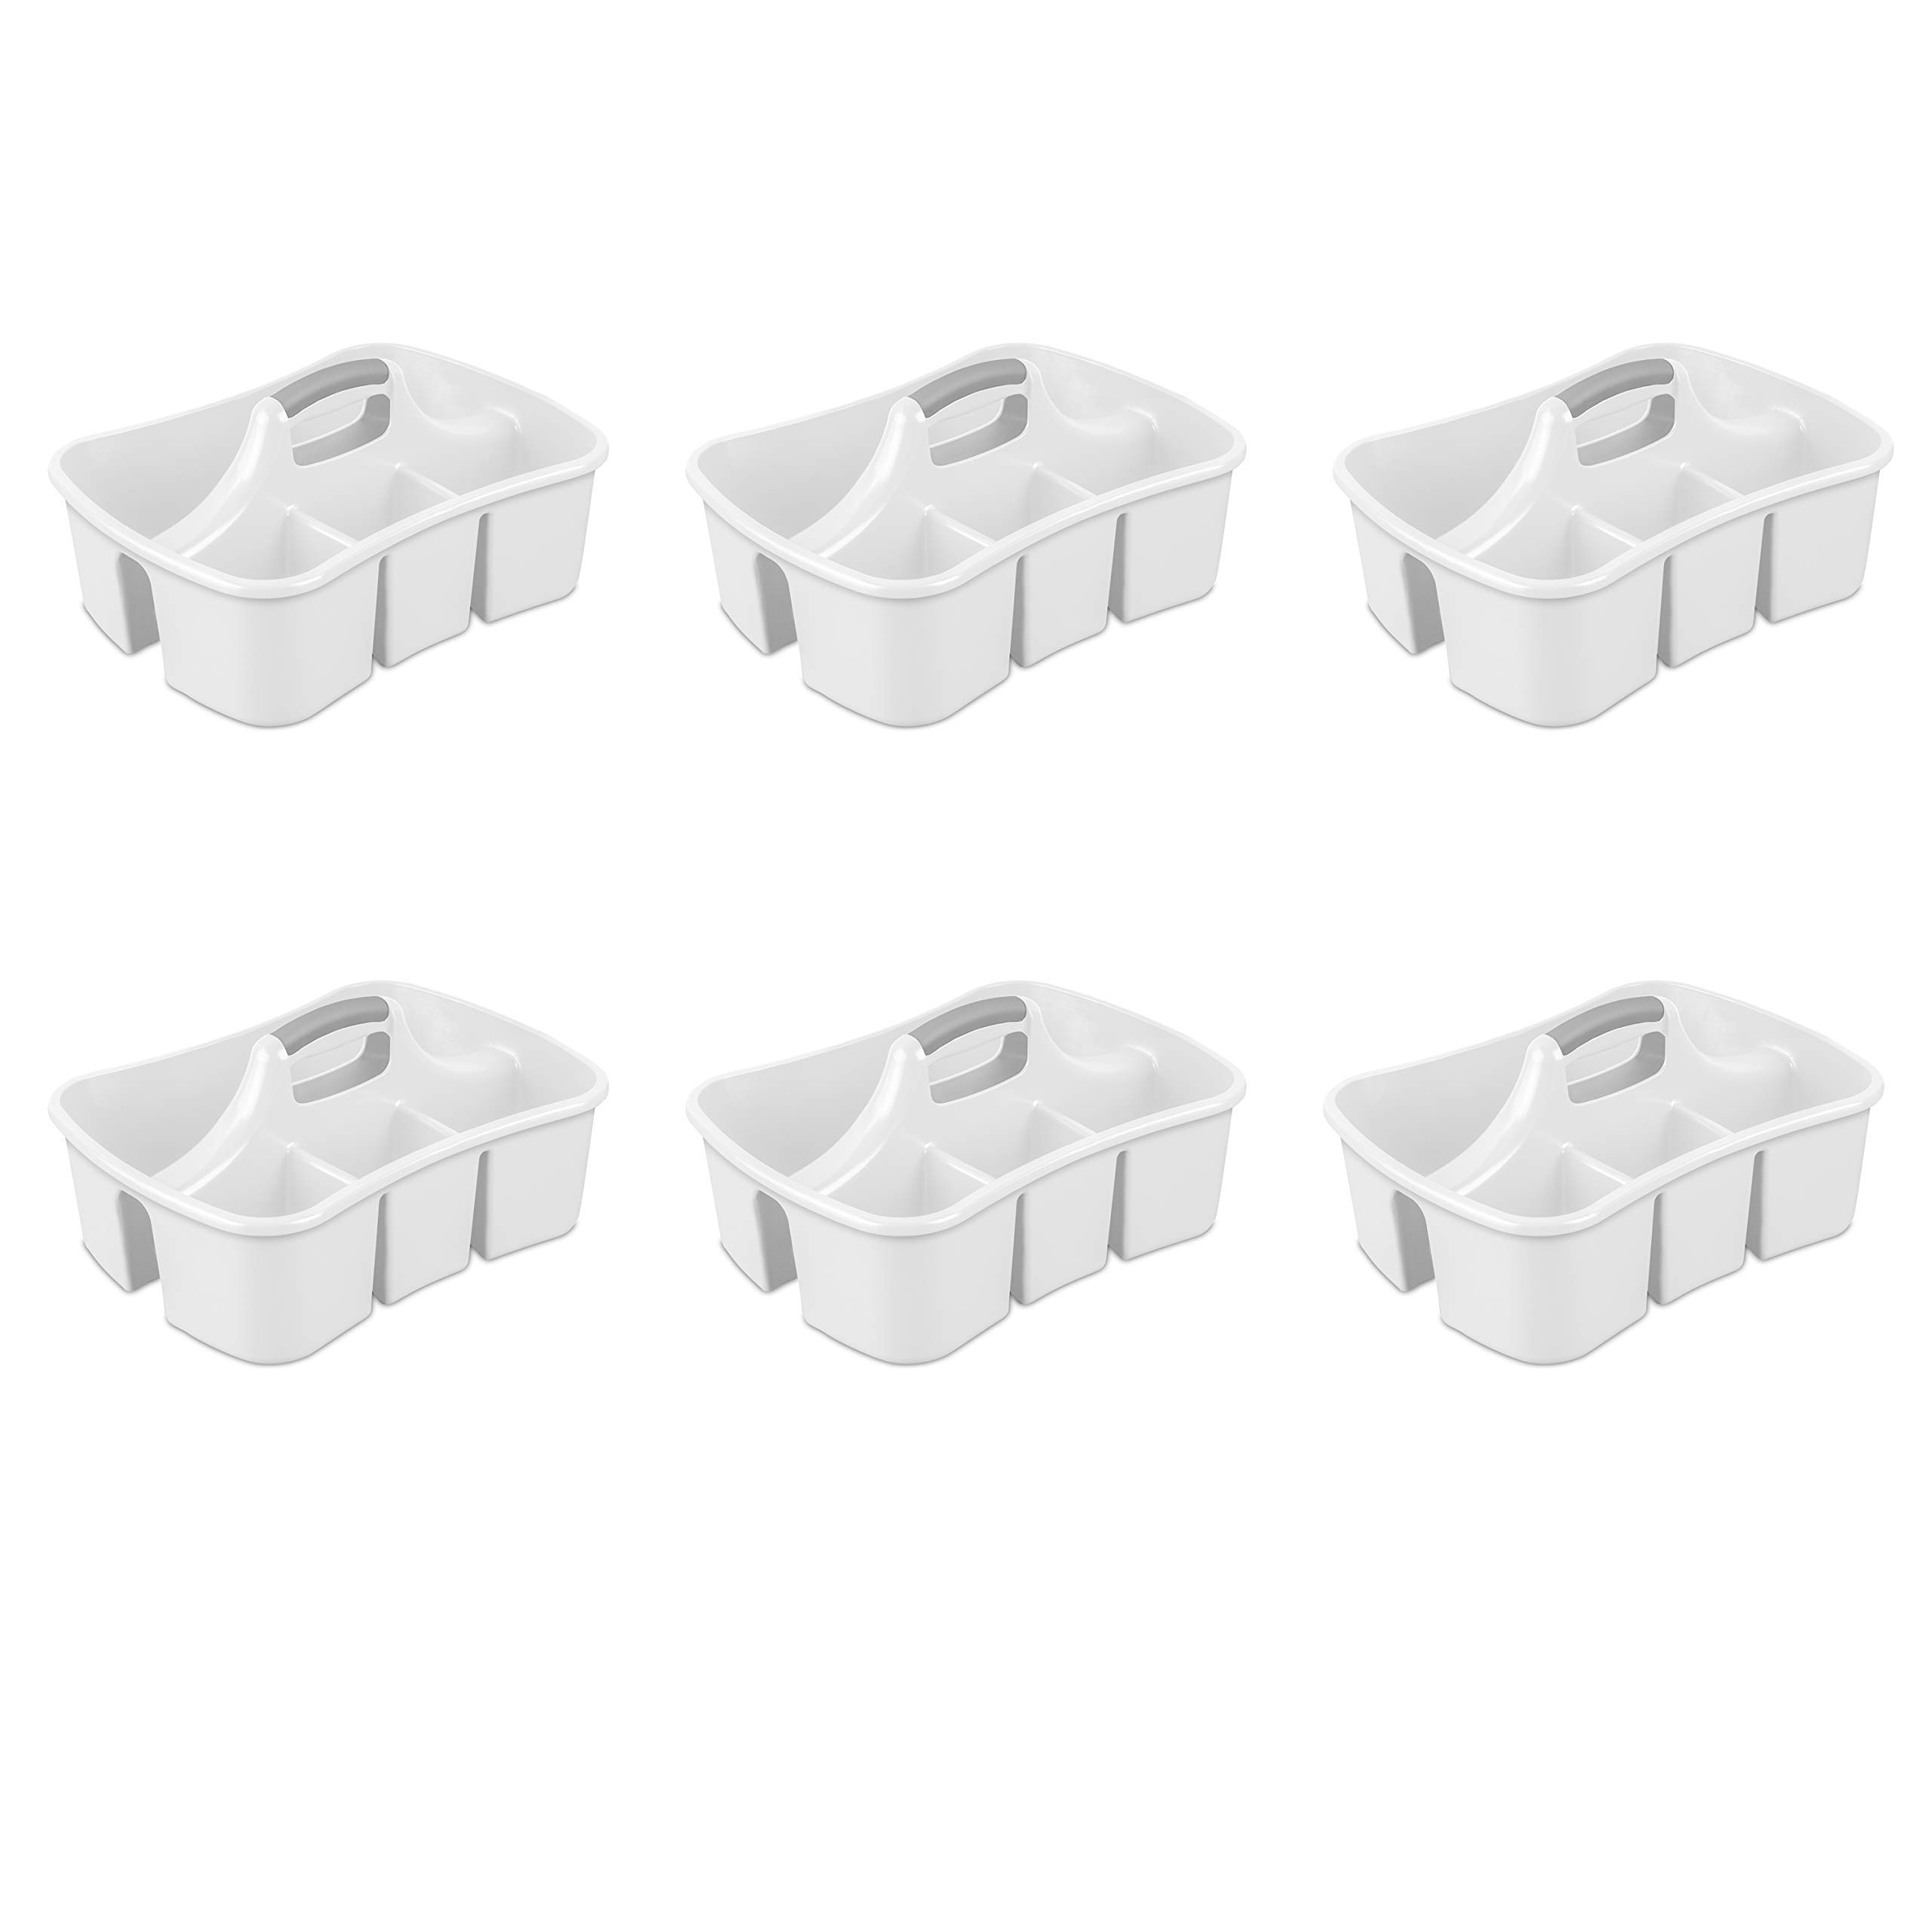 Sterilite 15888006 Divided Ultra Caddy, White Caddy w/ Titanium Insert, 6-Pack (Renewed)